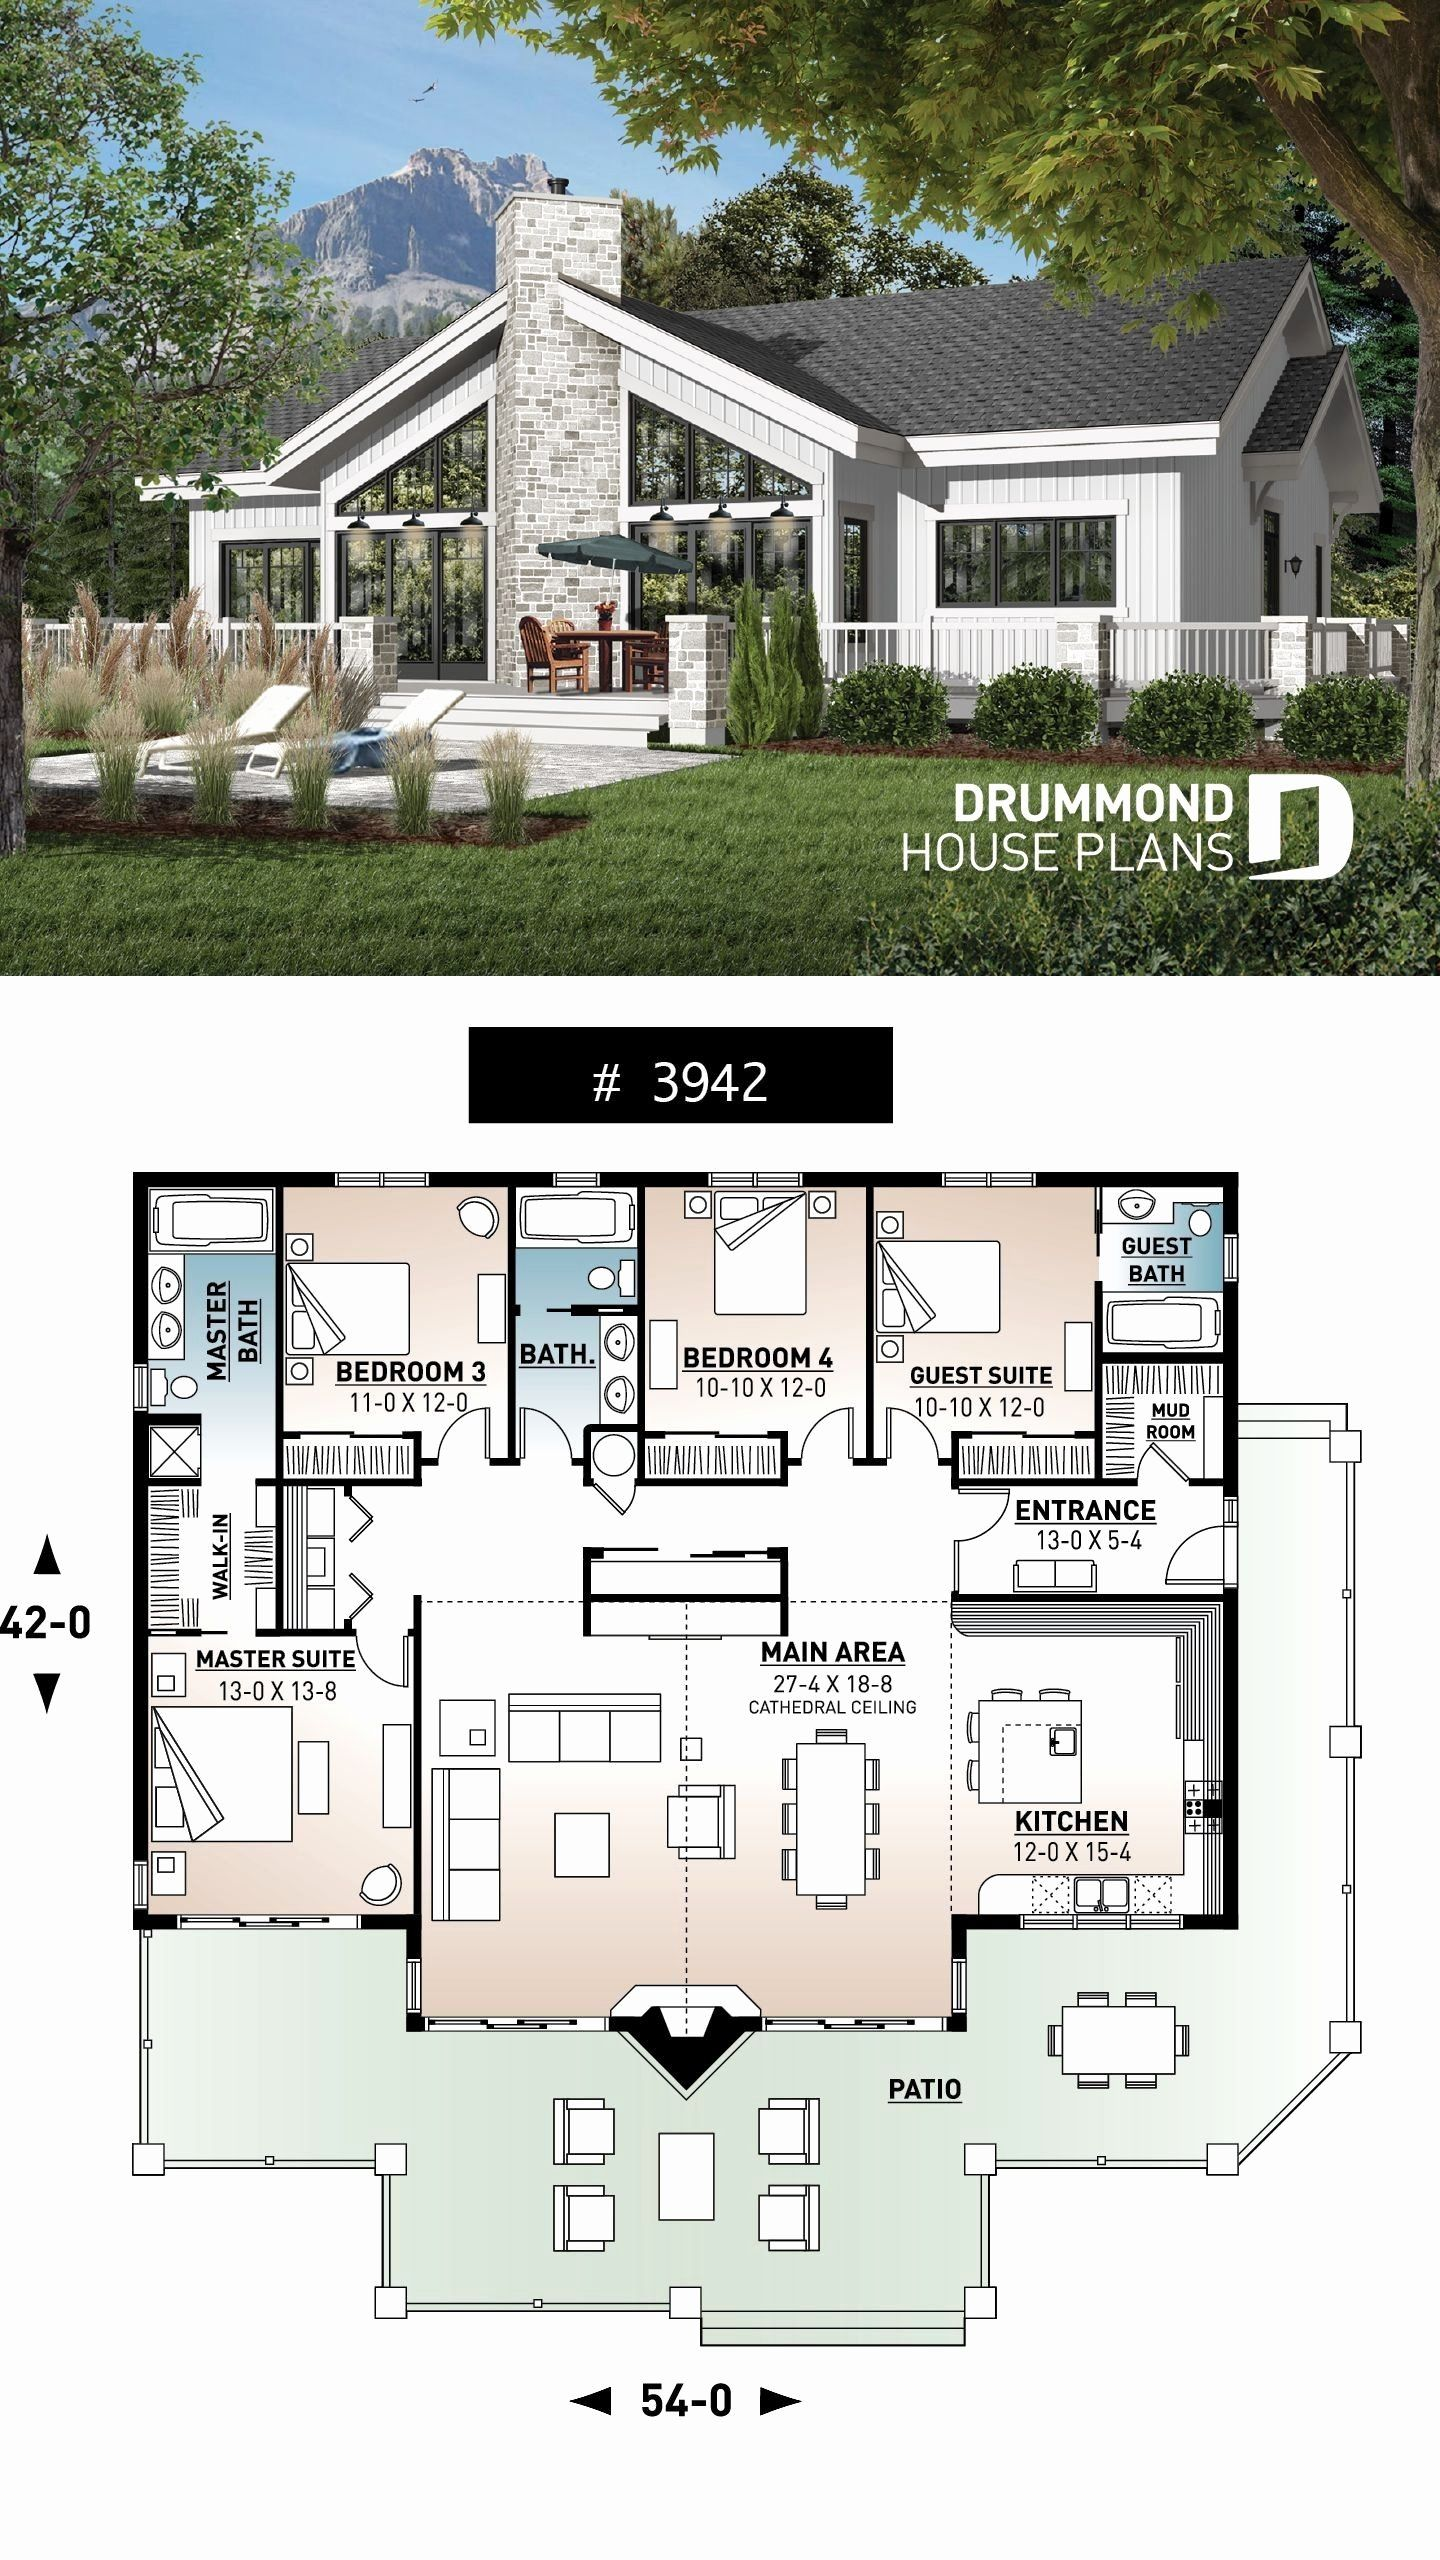 20 Bedroom House Plans Fresh 20 4 Bedroom House Designs In 2020 Lake House Plans Sims House Plans House Plans Farmhouse